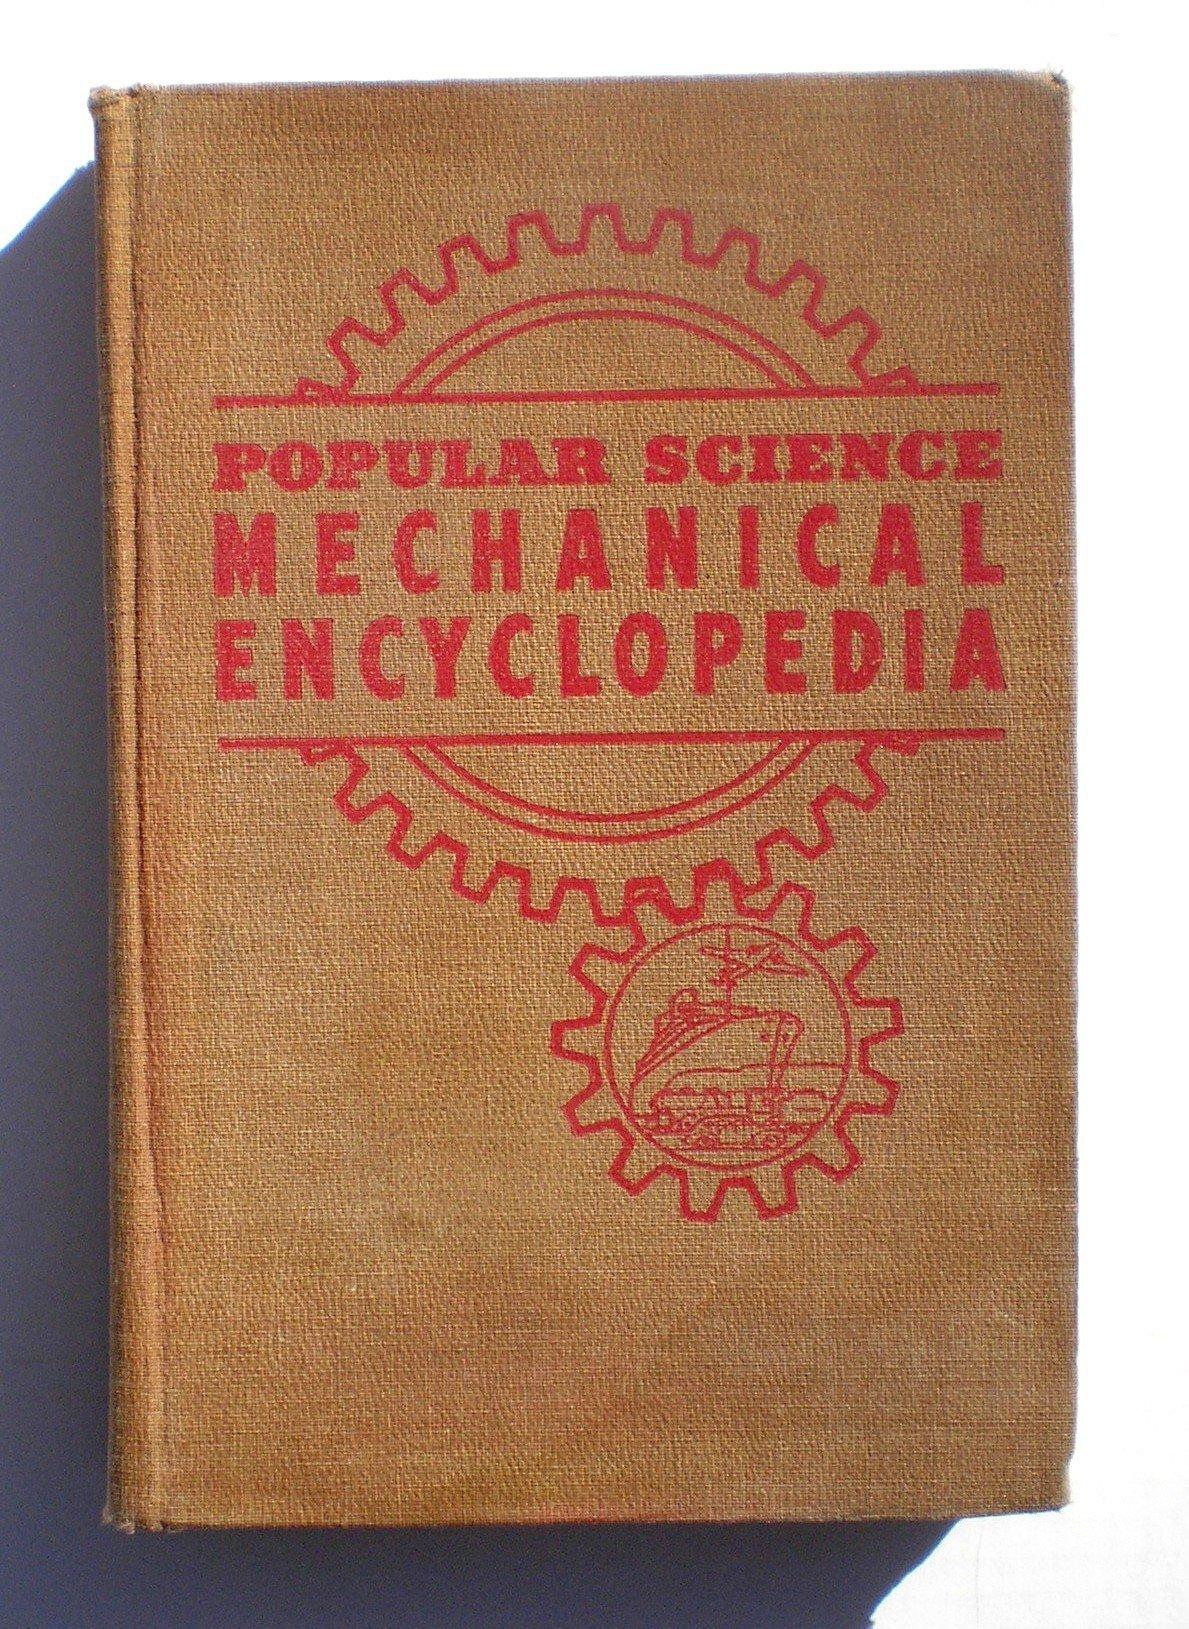 Popular Science Mechanical Encyclopedia